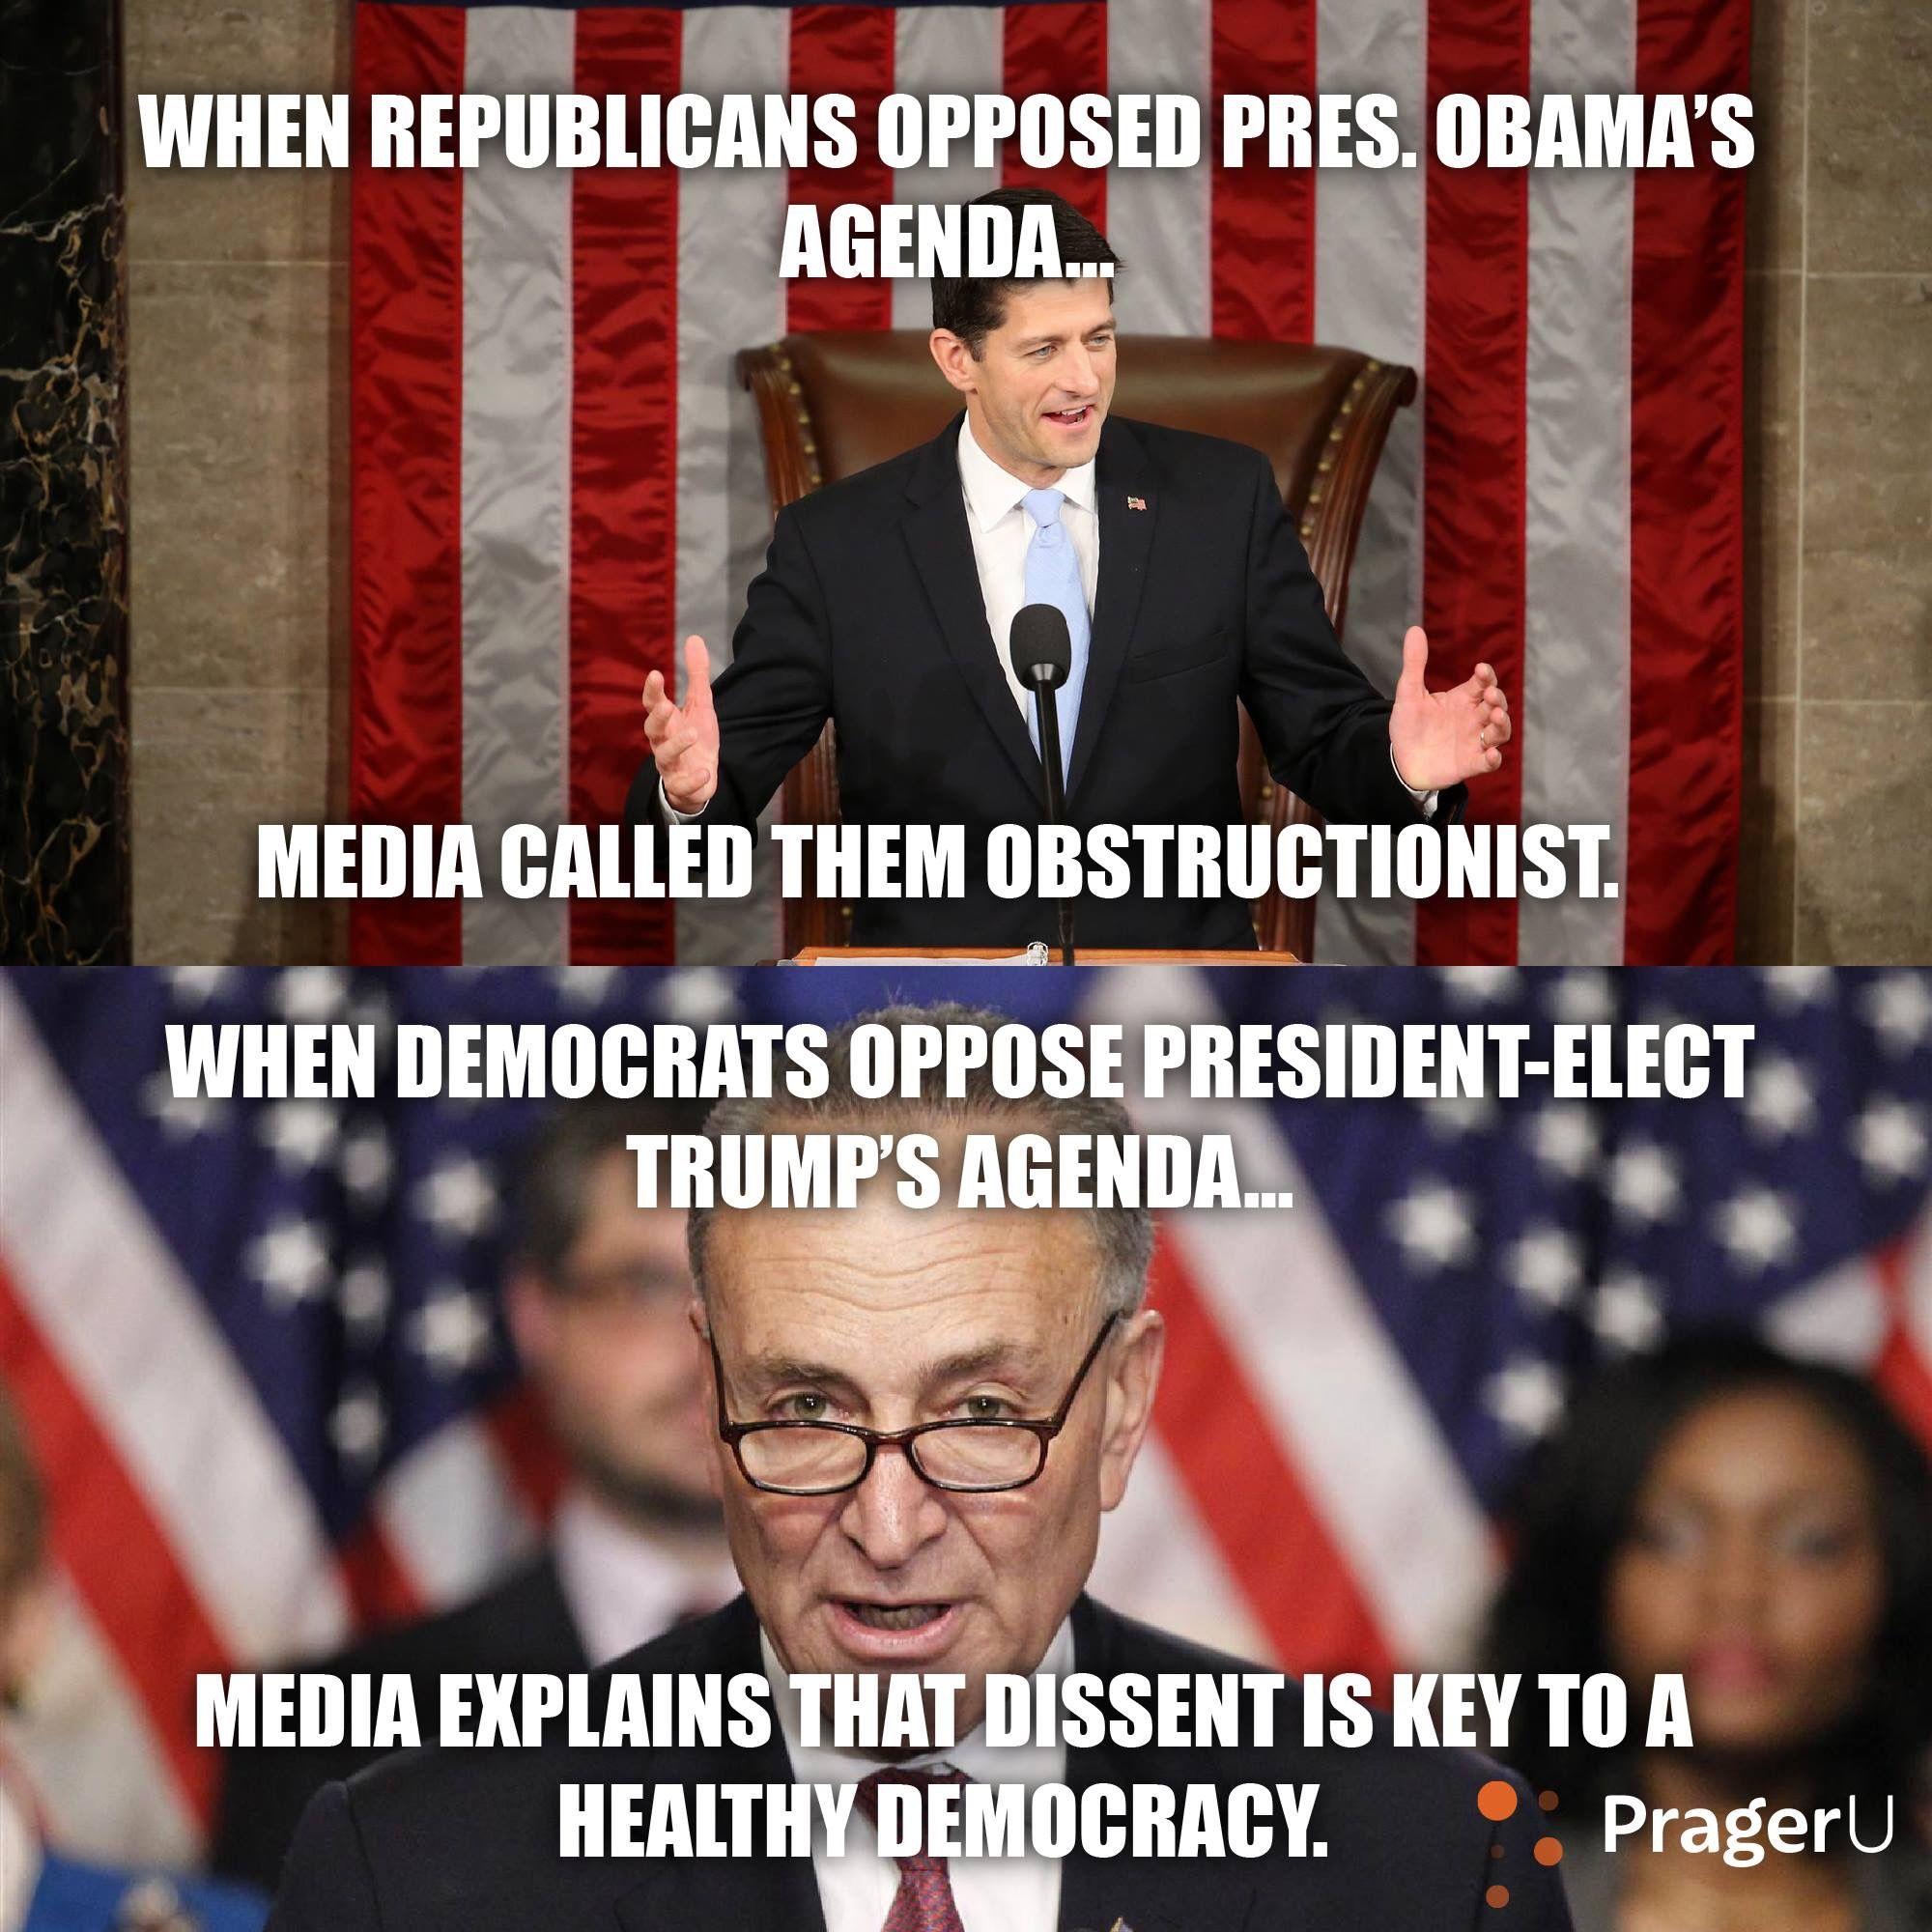 Boom Medias Shameless Partisan Hypocrisy Perfectly Exposed